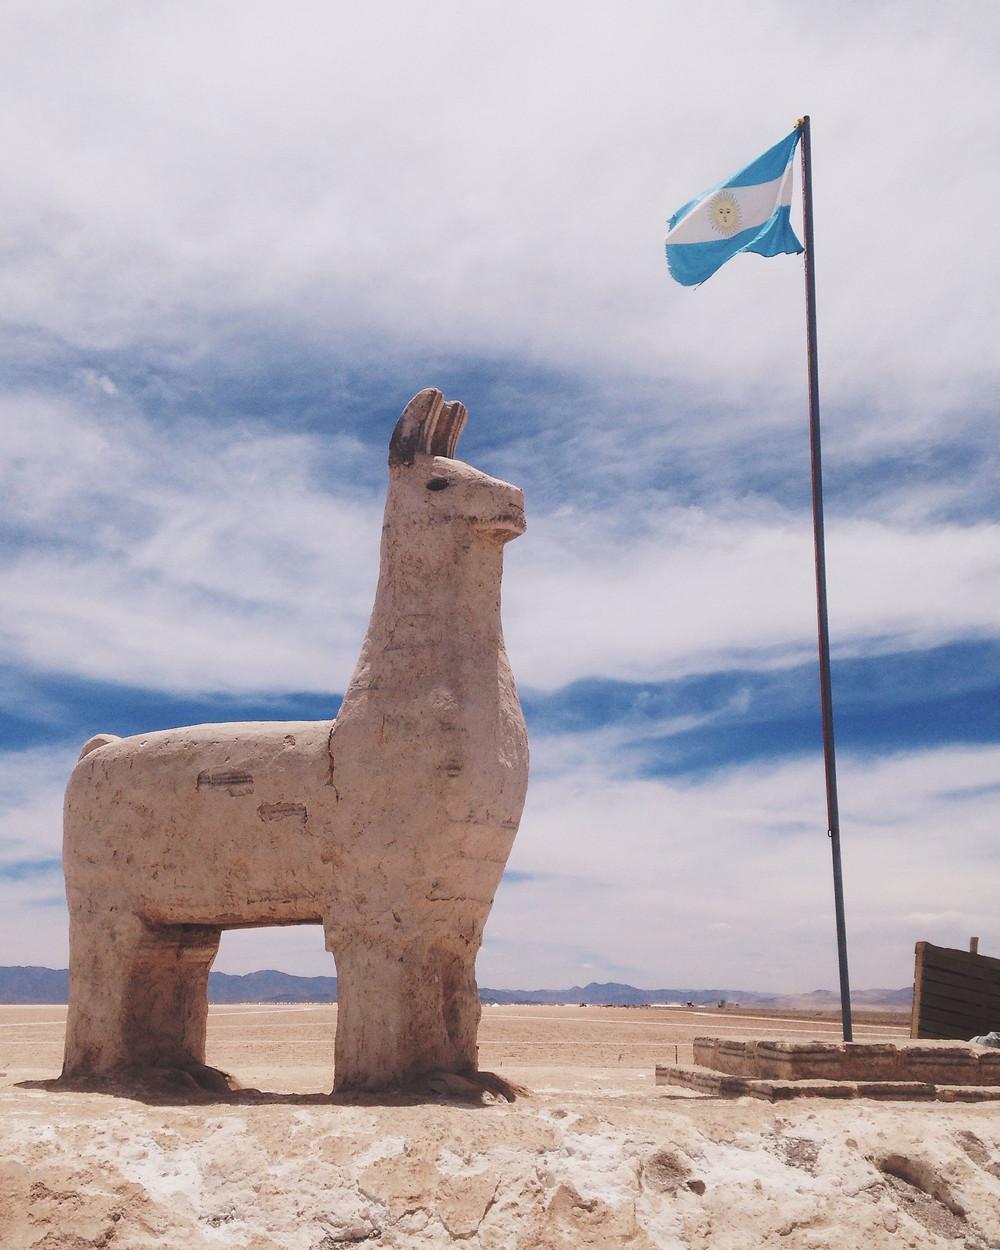 Salinas Grandes, Argentina - 2015 - Foto Raquel Bloomfield